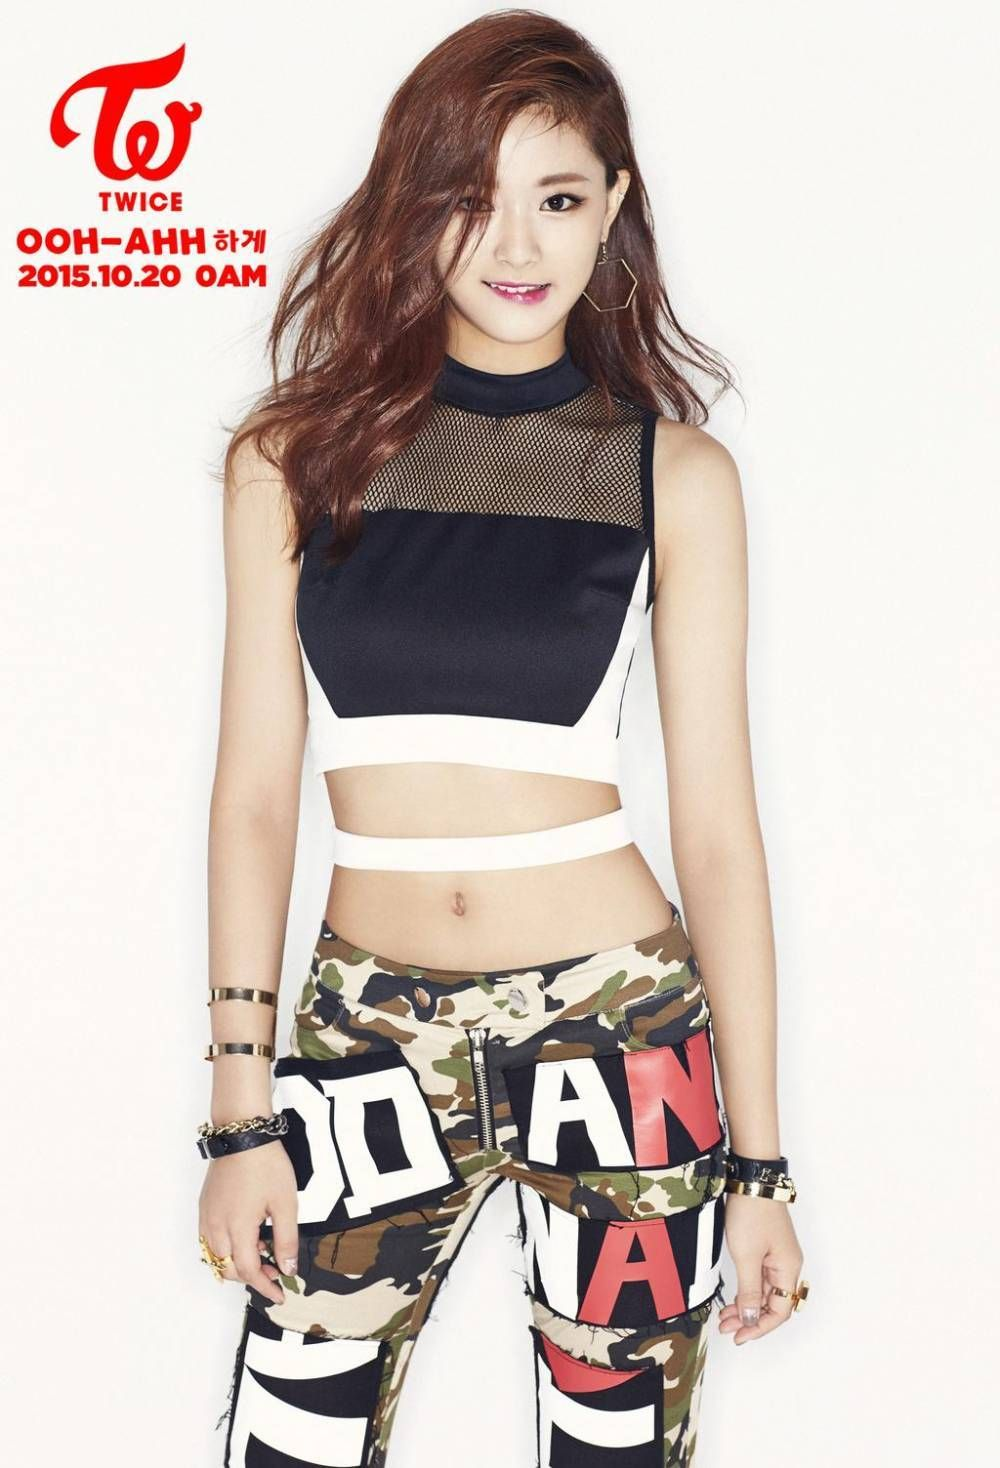 Ask K Pop Askkpop An Investigation Has Begun Regarding If Tzuyu S Apology Was Forced Or Voluntary Kpop Girls Kpop Fashion Korean Fashion